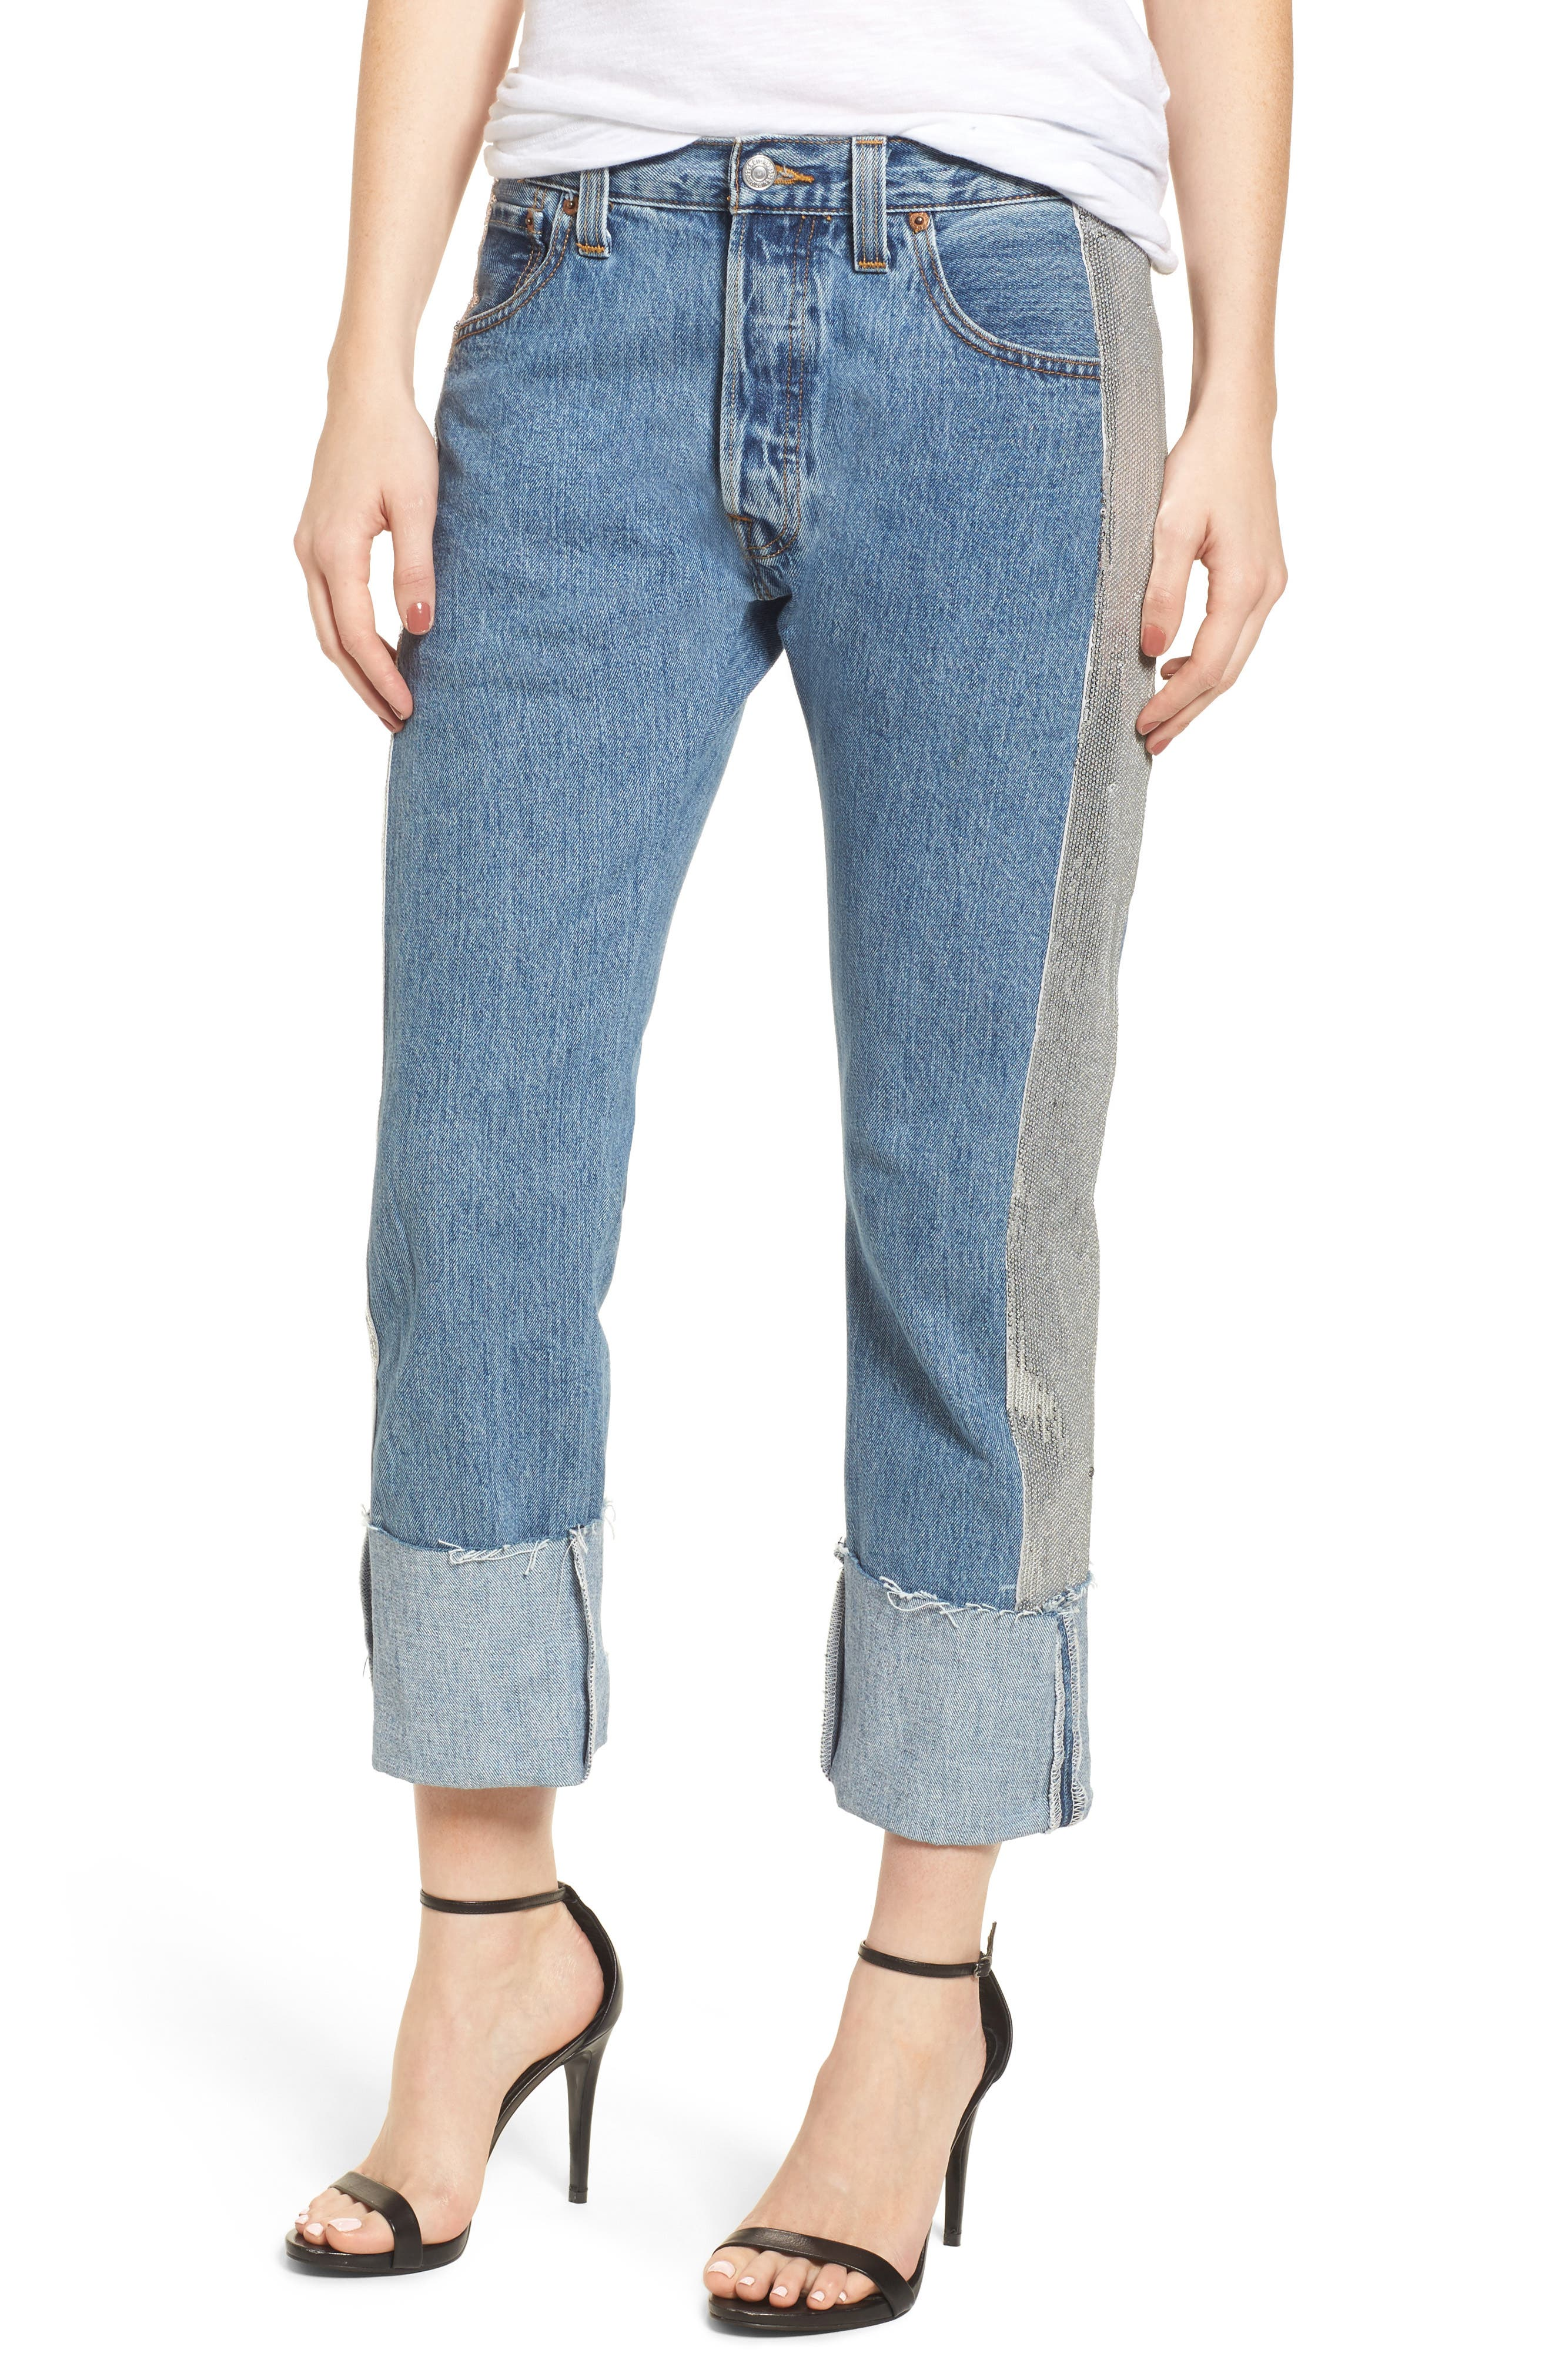 Sequin Boyfriend Jeans,                         Main,                         color, Medium Wash/ Silver